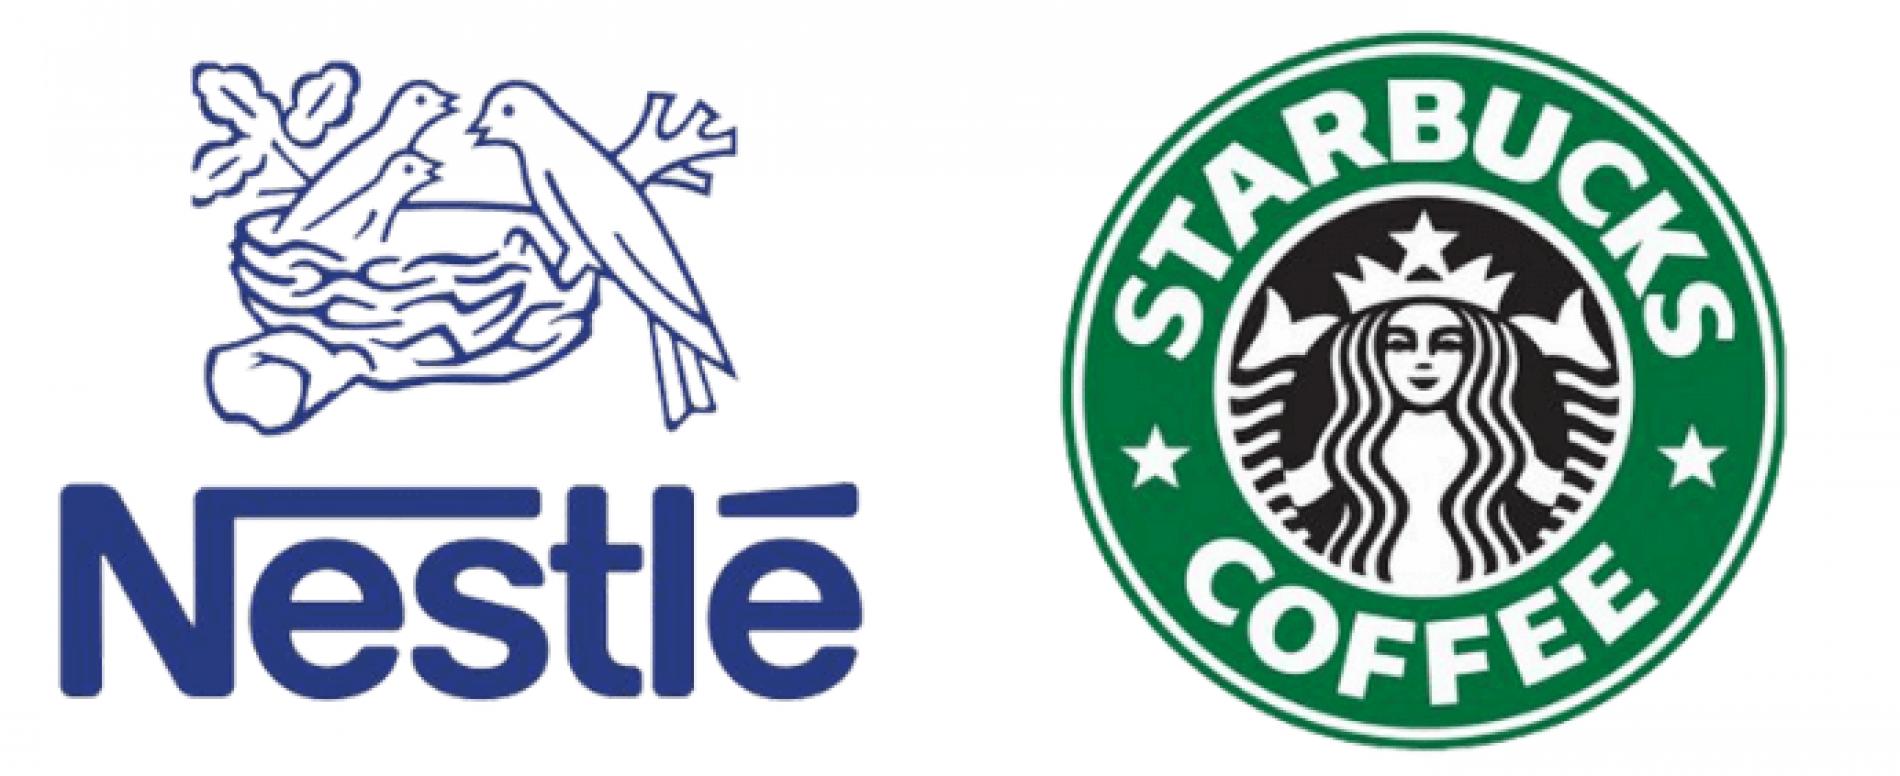 Da febbraio Nestlé inizia a vendere caffè targato Starbucks